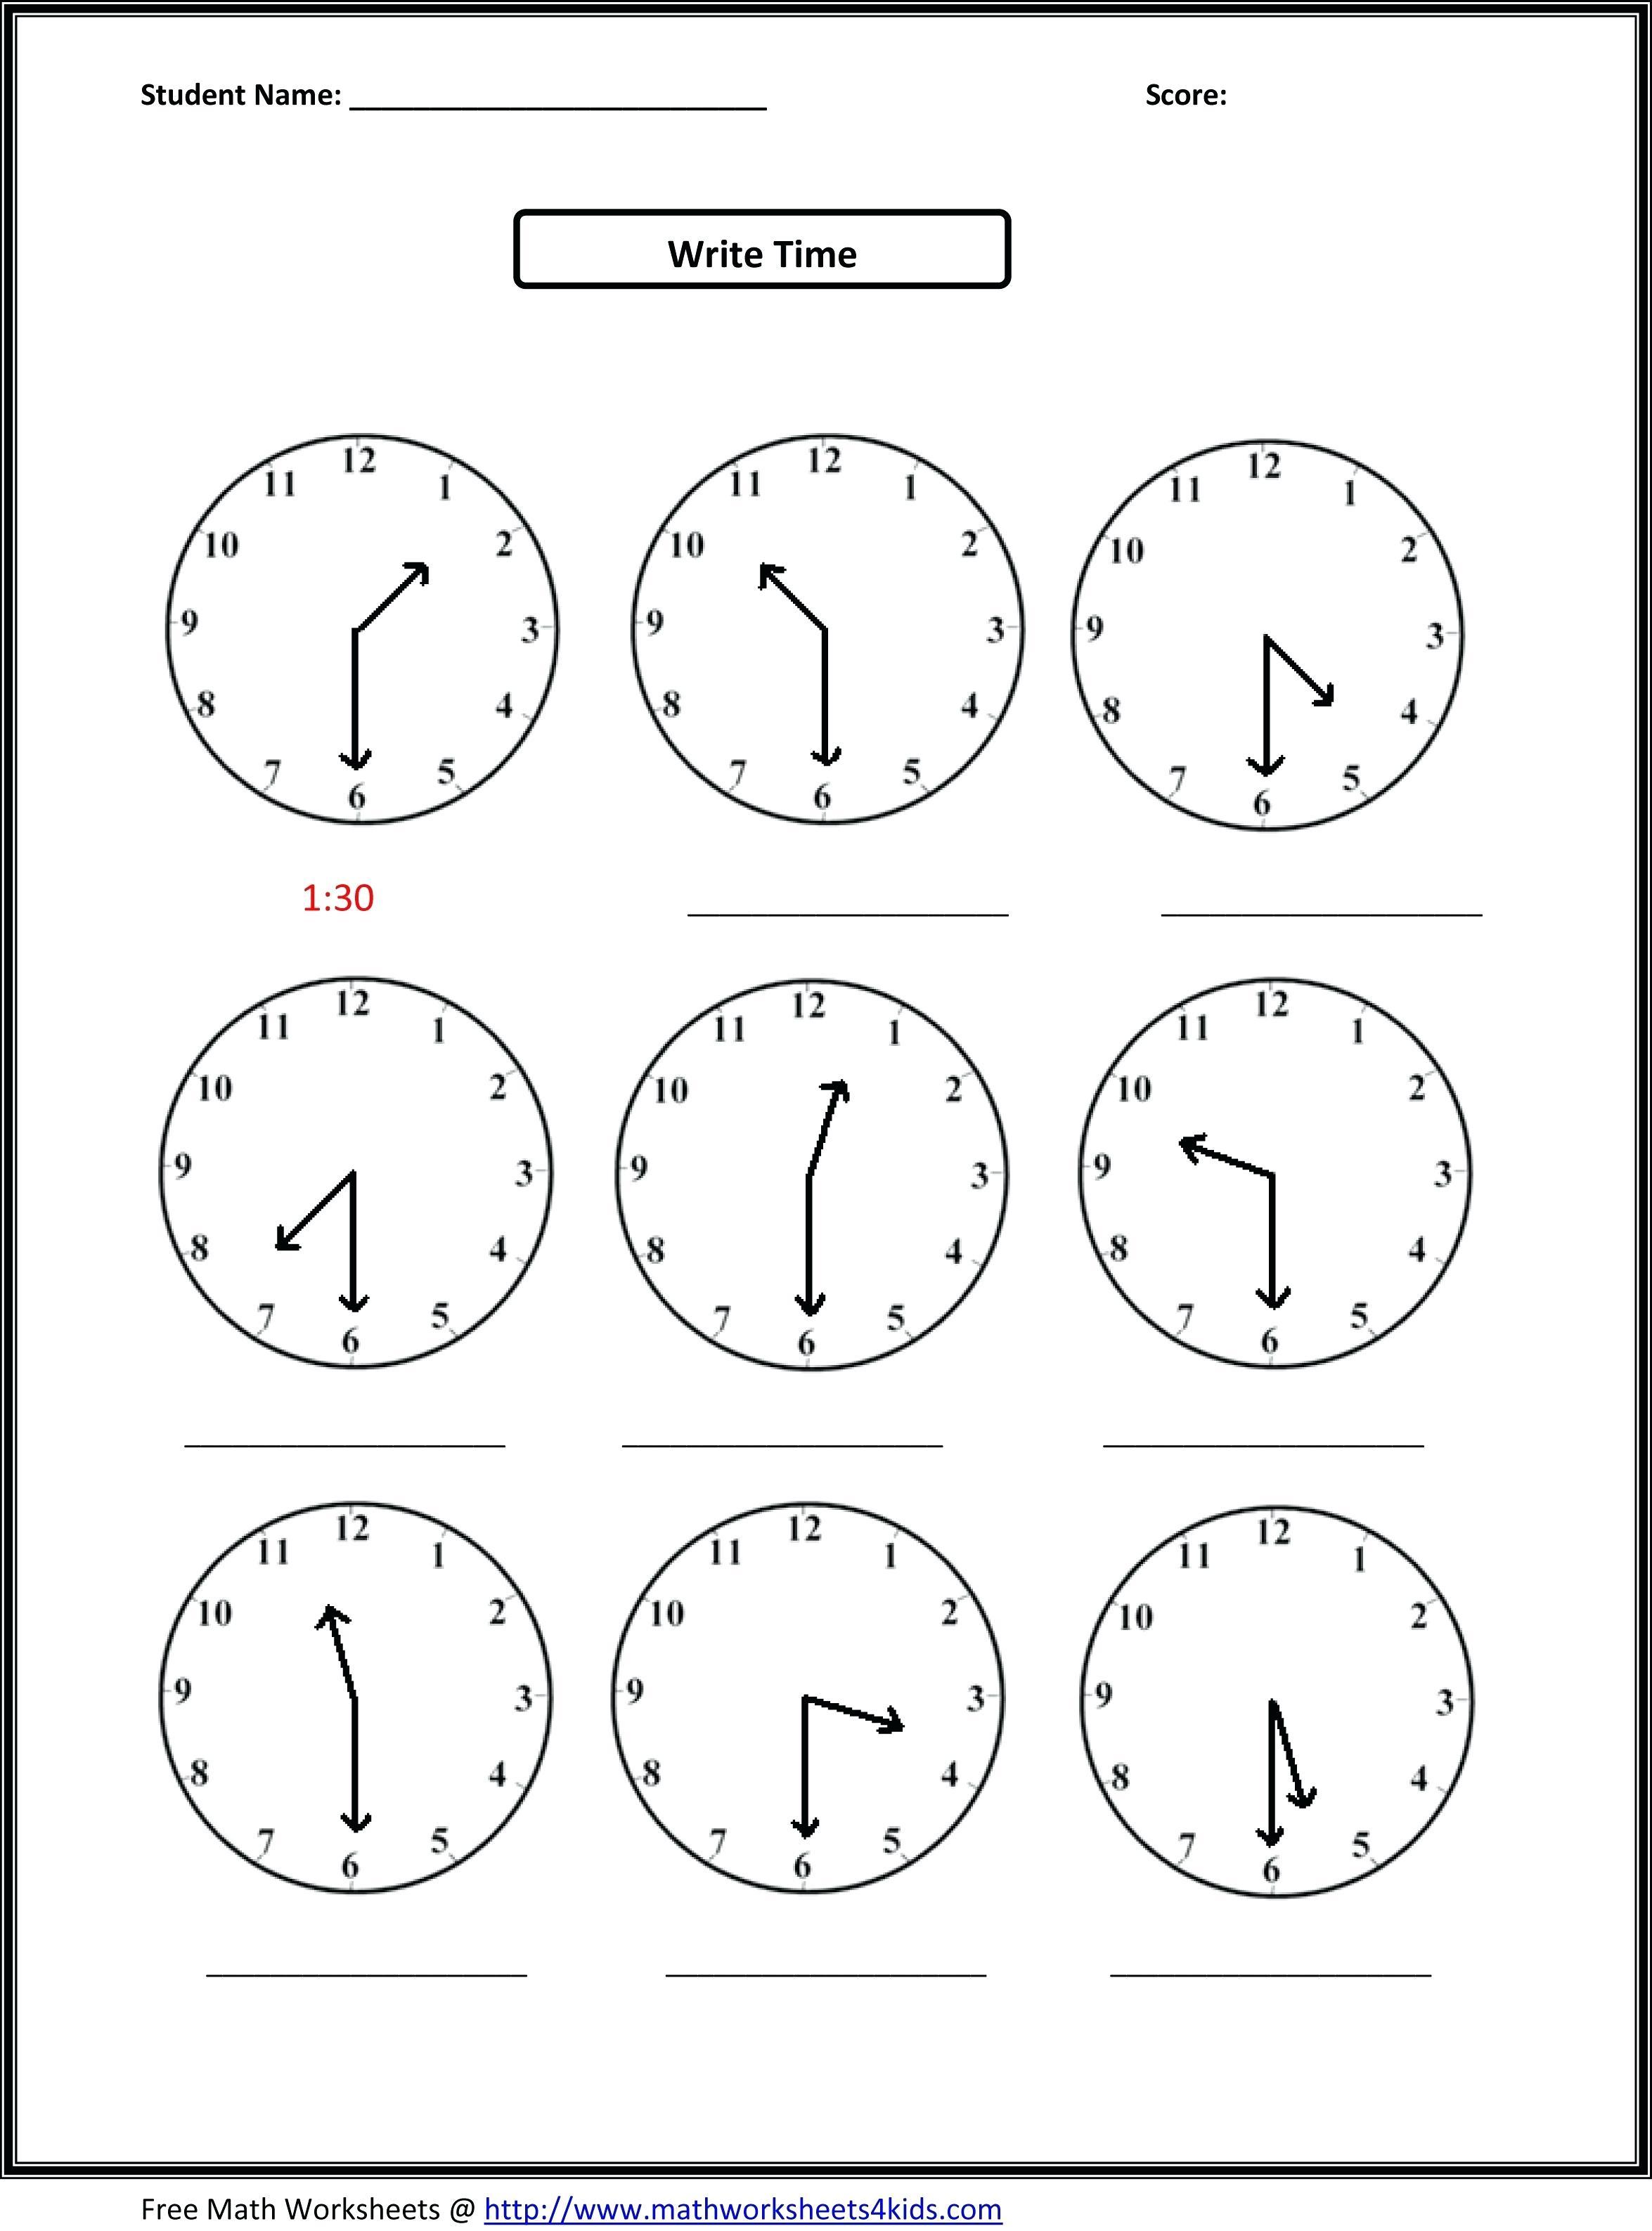 Math Worksheets 1St Grade Free Printable Common Core First | Tiktokcook | Printable Math Worksheets Www Mathworksheets4Kids Com